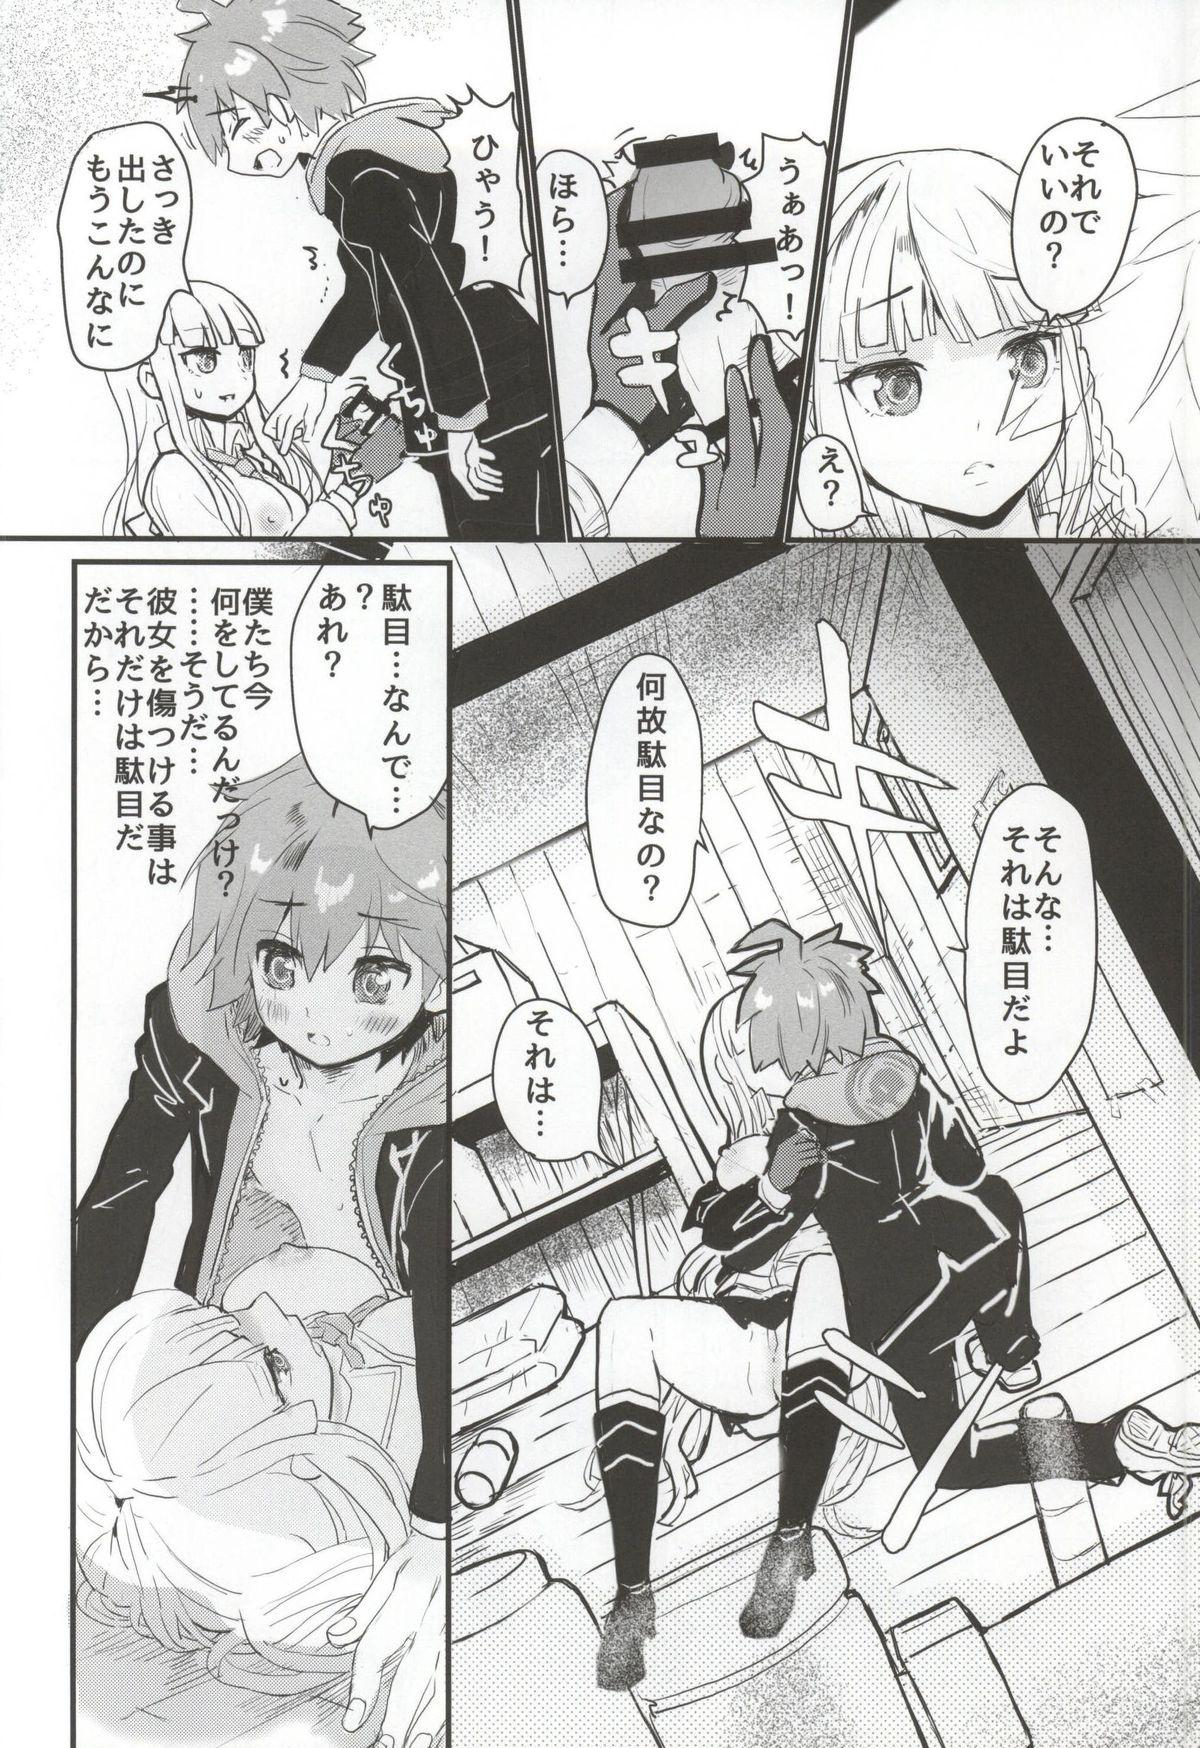 Kirigiri-san to Issho ni School Mode 14